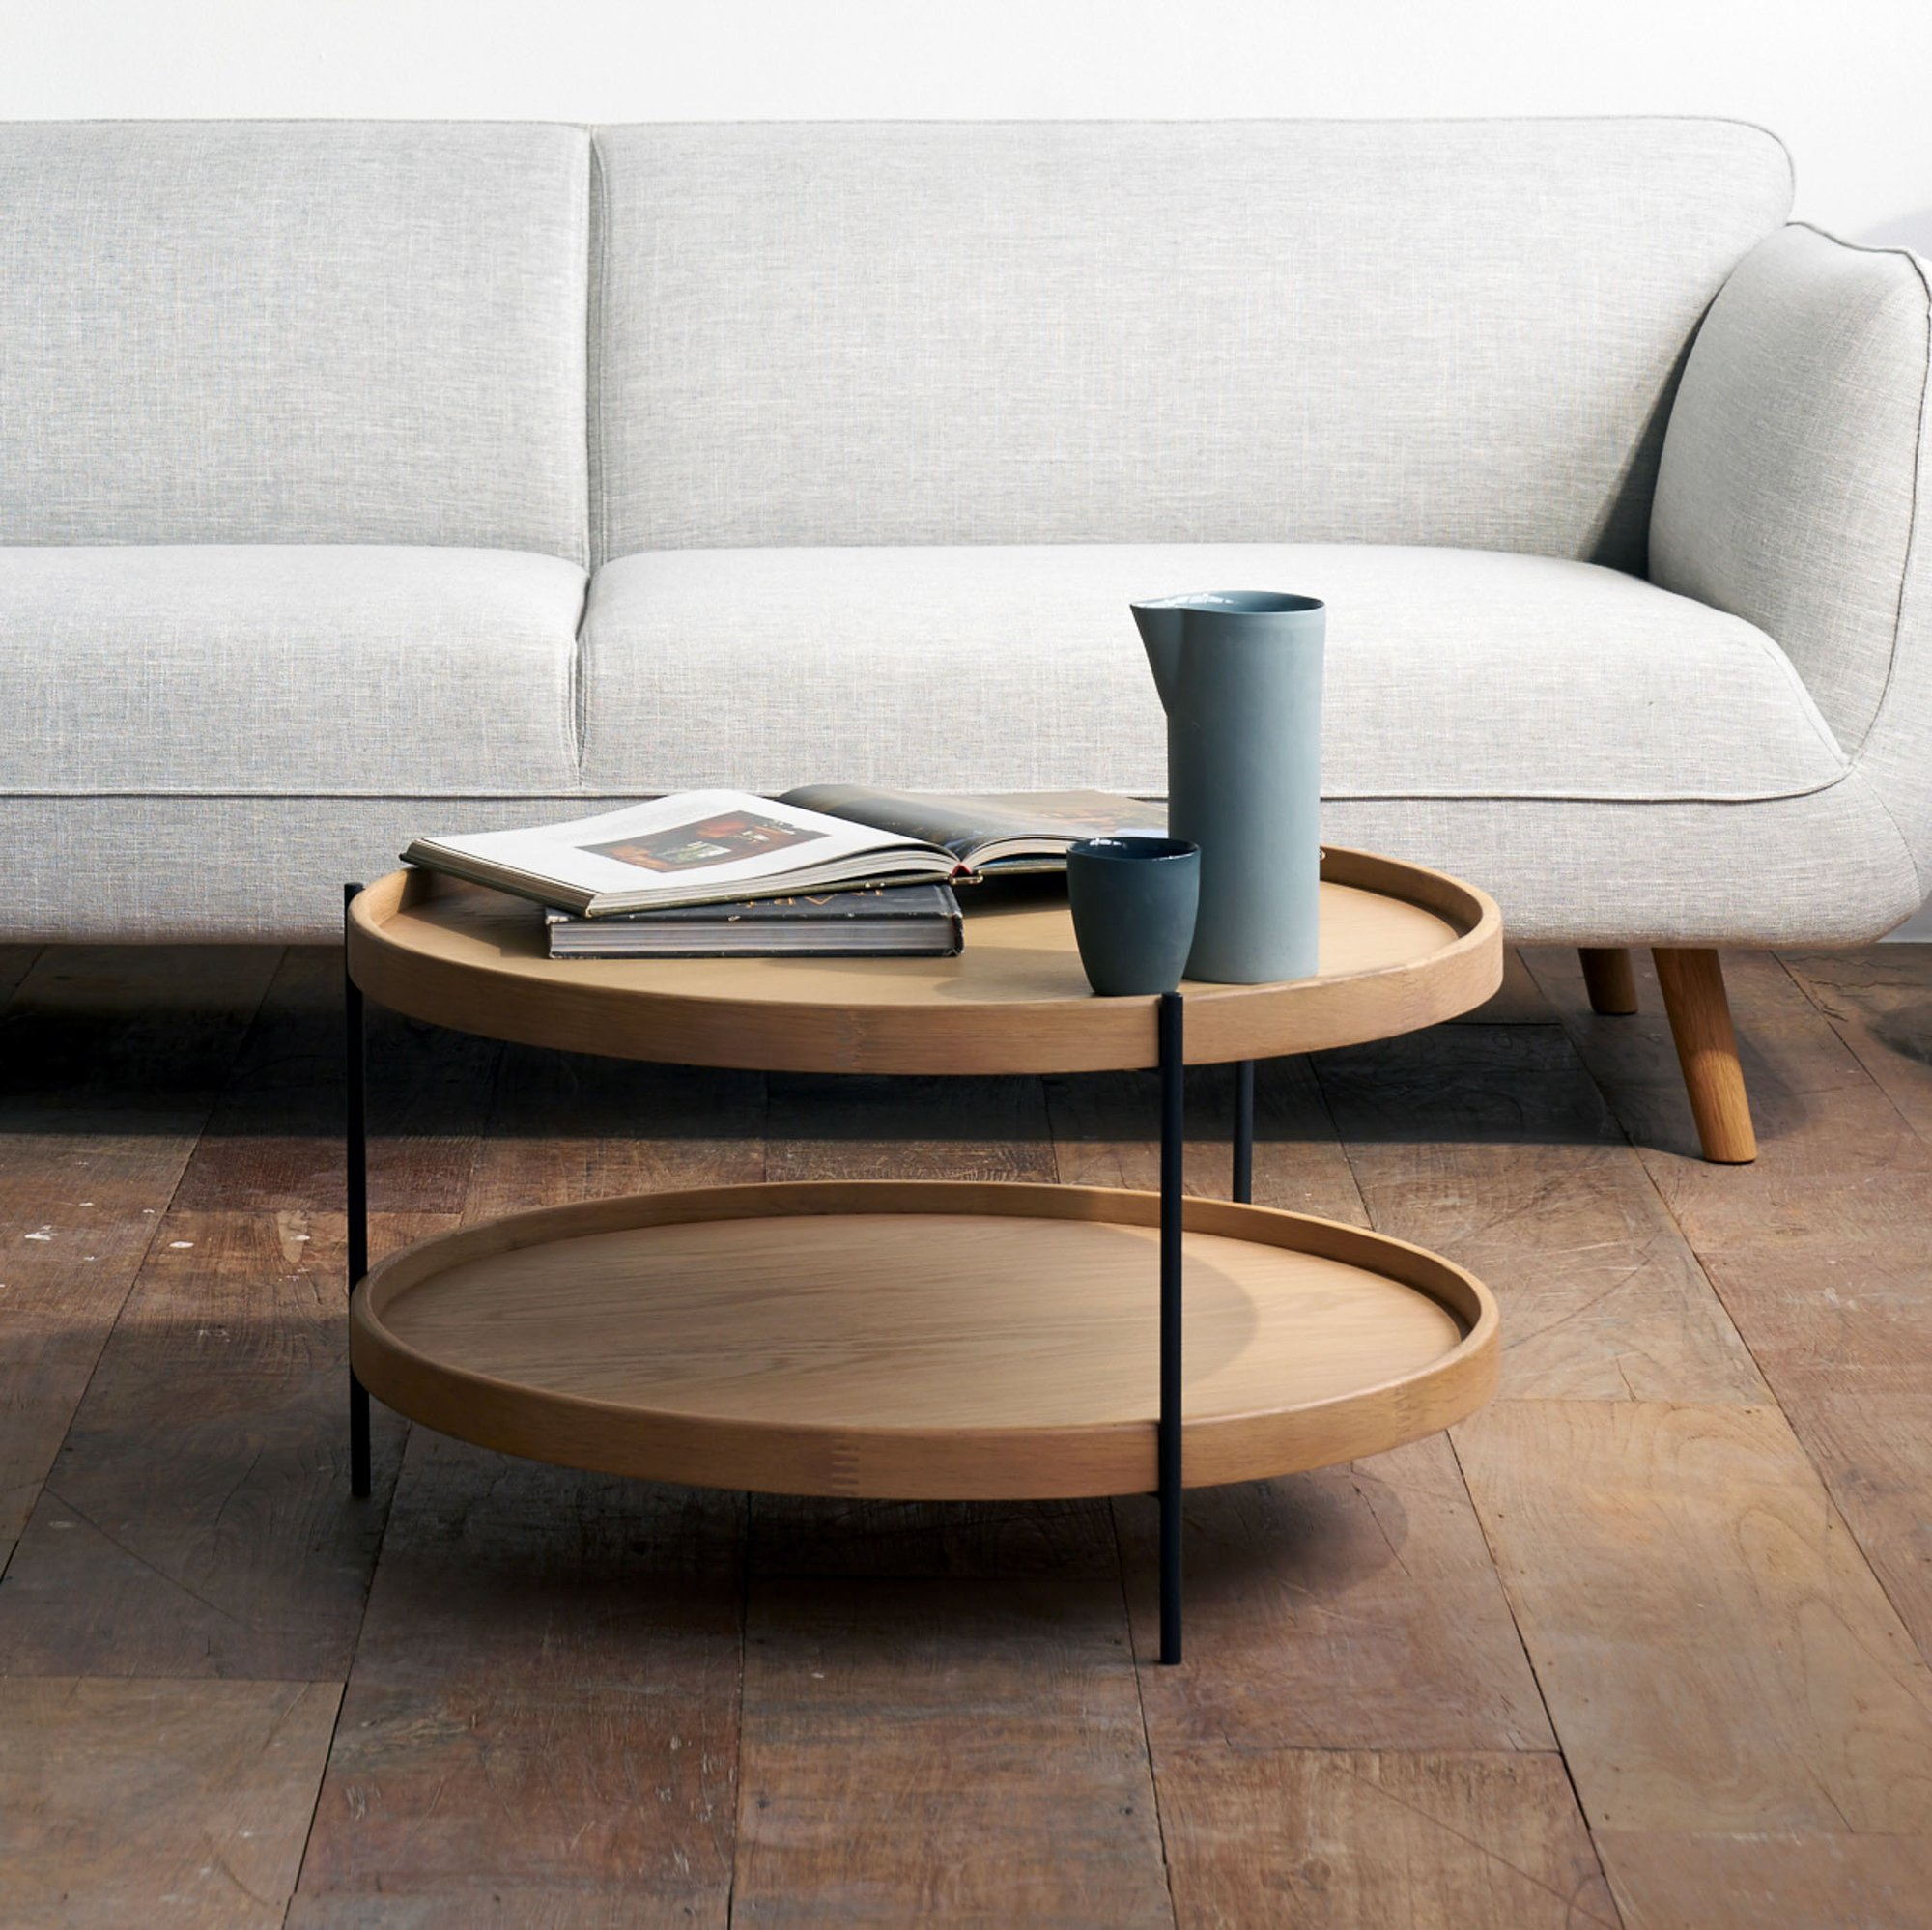 Teak Round Coffe table